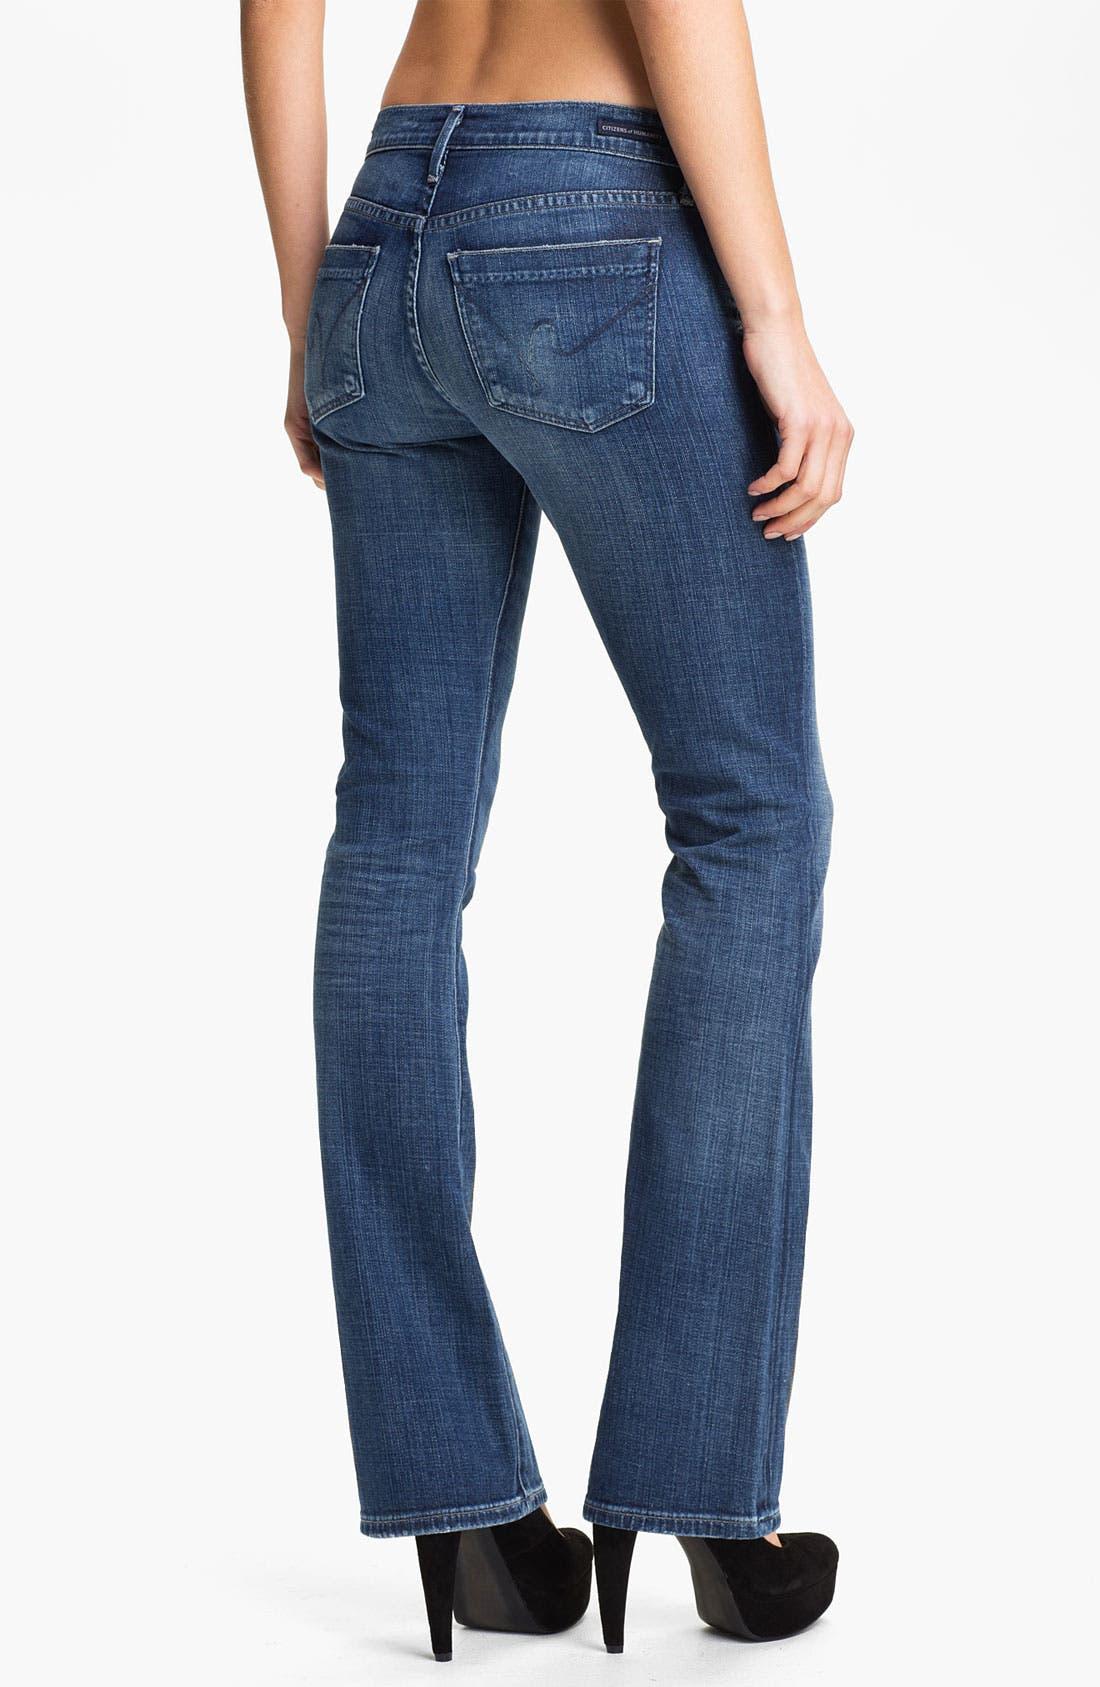 Alternate Image 2  - Citizens of Humanity 'Dita' Slim Bootcut Jeans (Wedgewood) (Petite)